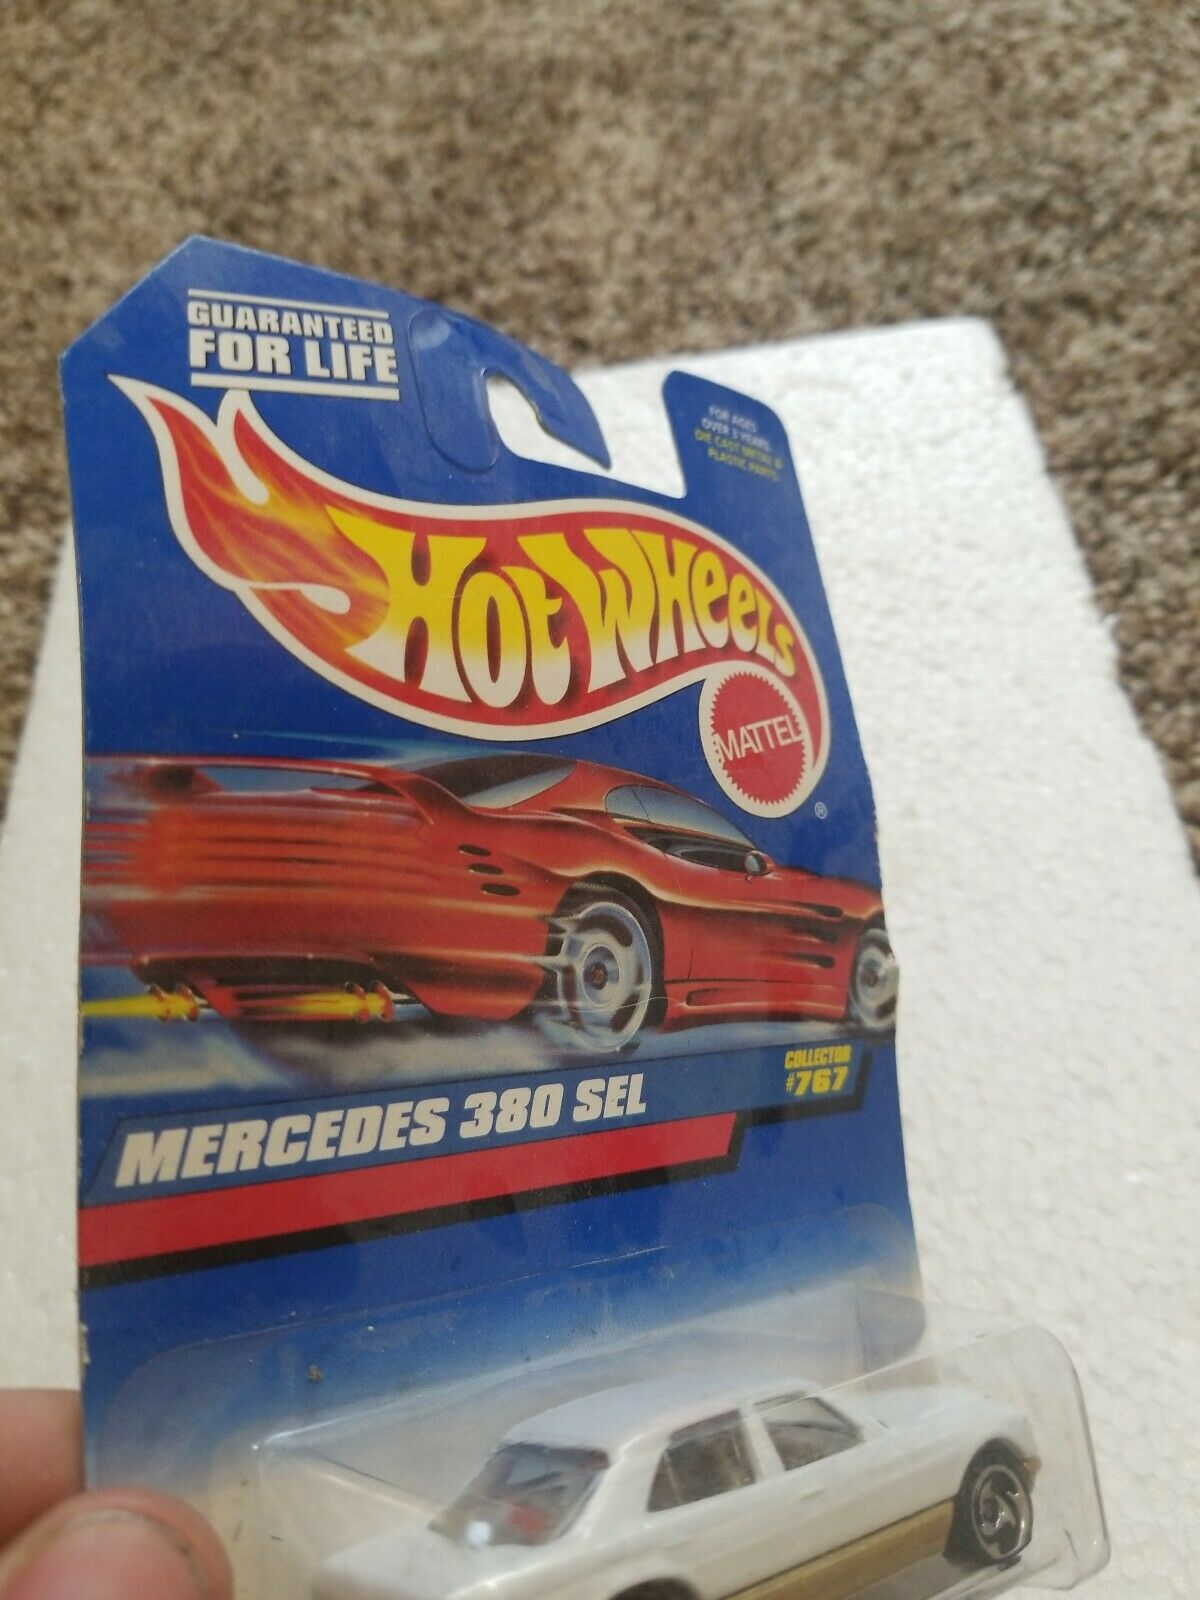 HOT WHEELS MERCEDES 380 SEL #767 Die-Cast Car MOC COMPLETE 1997